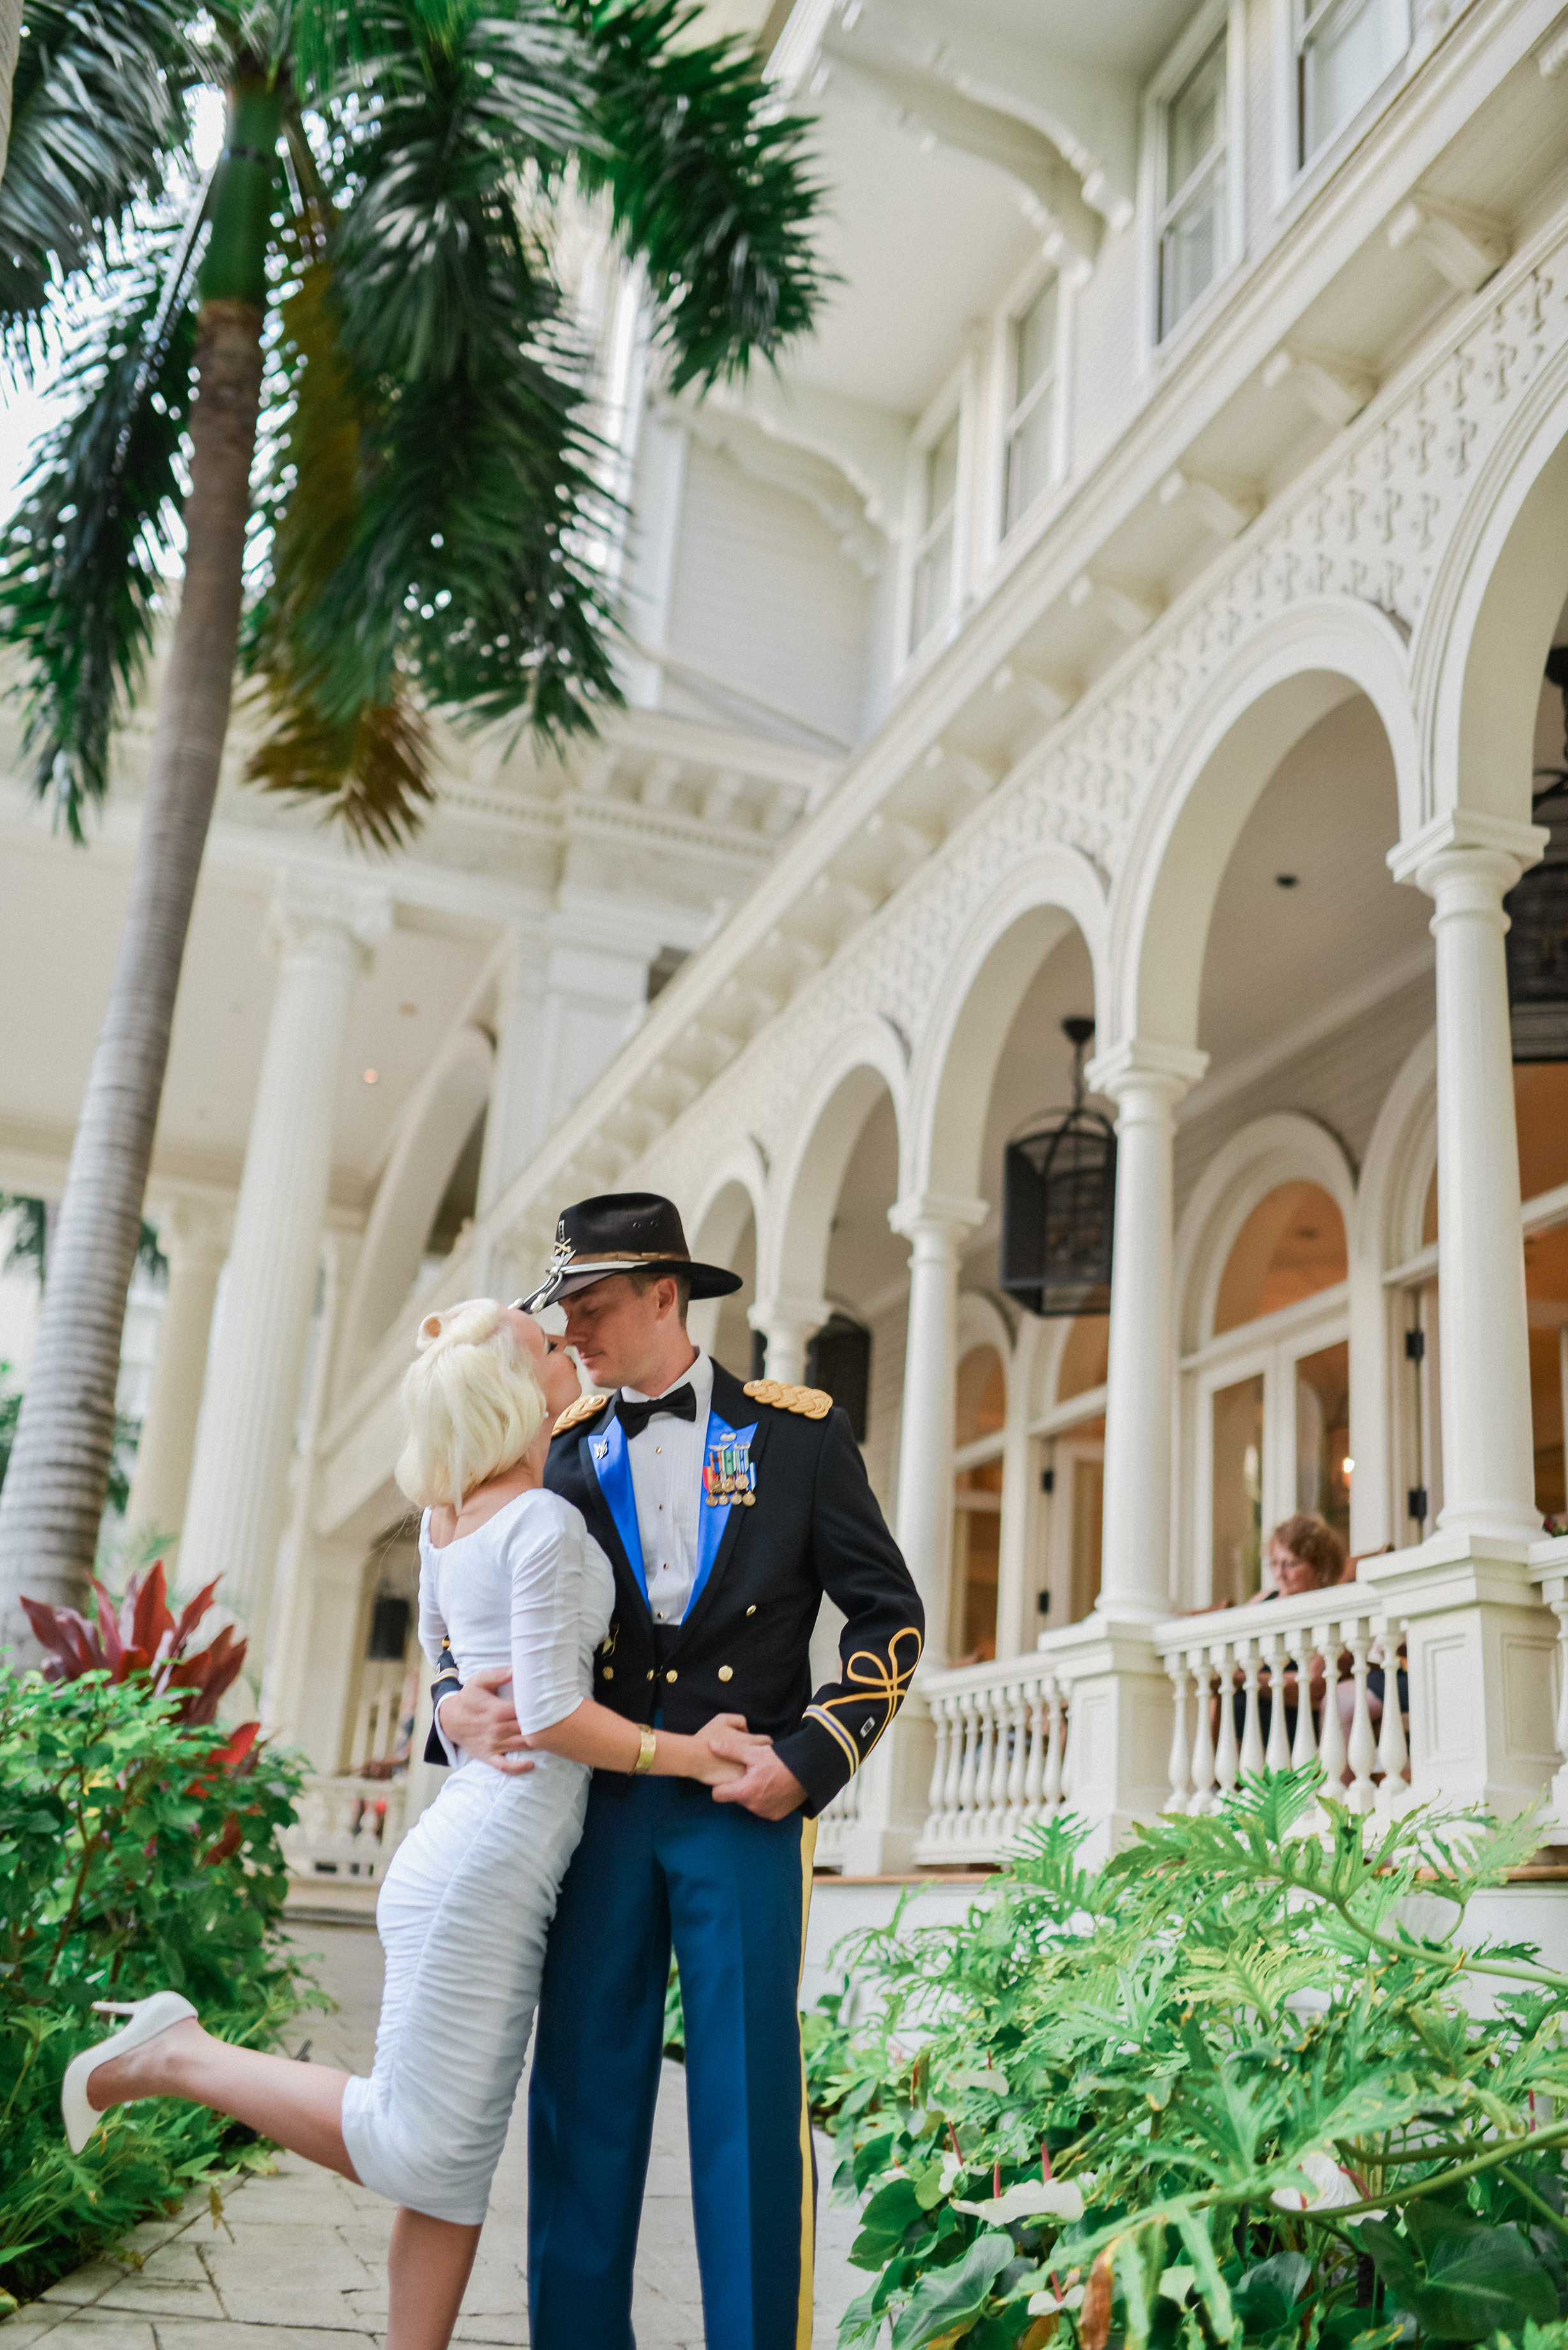 moana surfrider hotel wedding oahu hawaii stephen ludwig photography (33).jpg